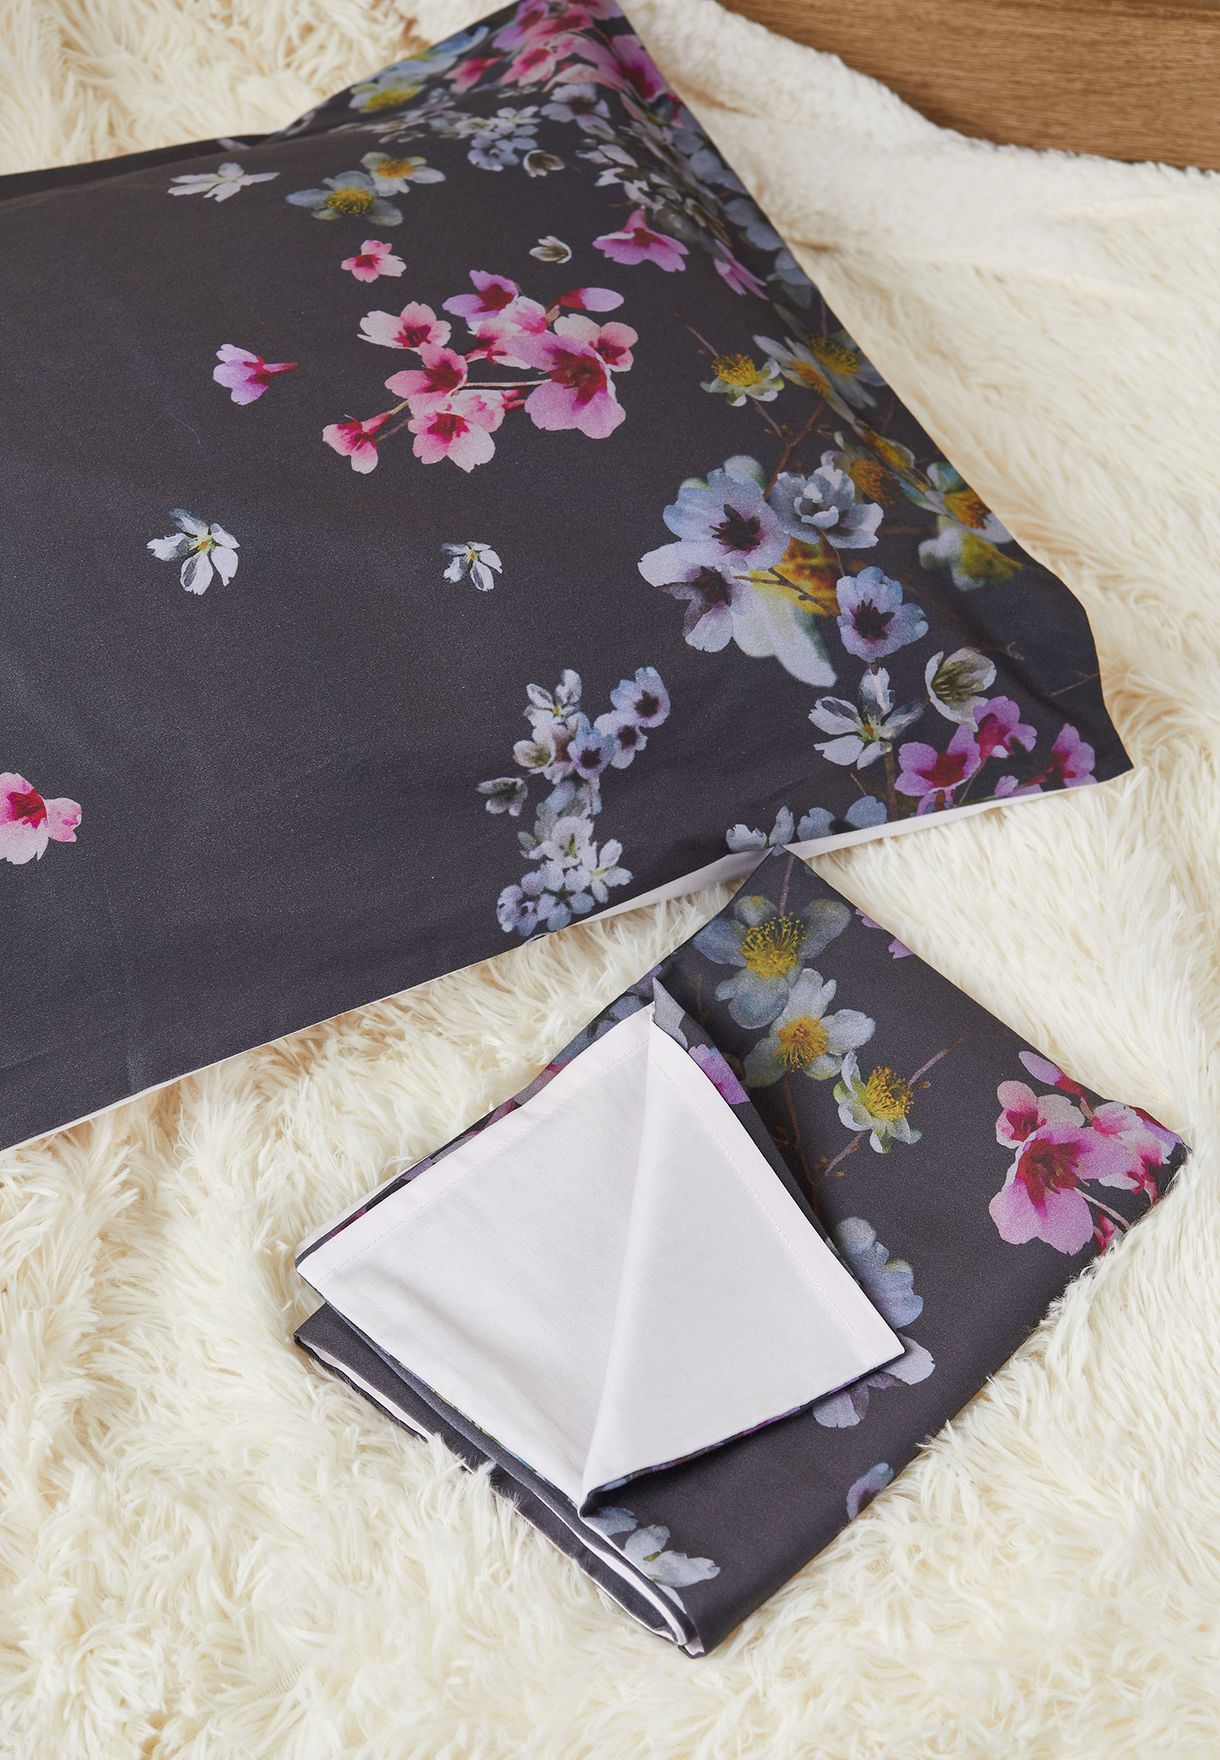 Spice Garden Standard Pillowcase Pair 48 x 74cm